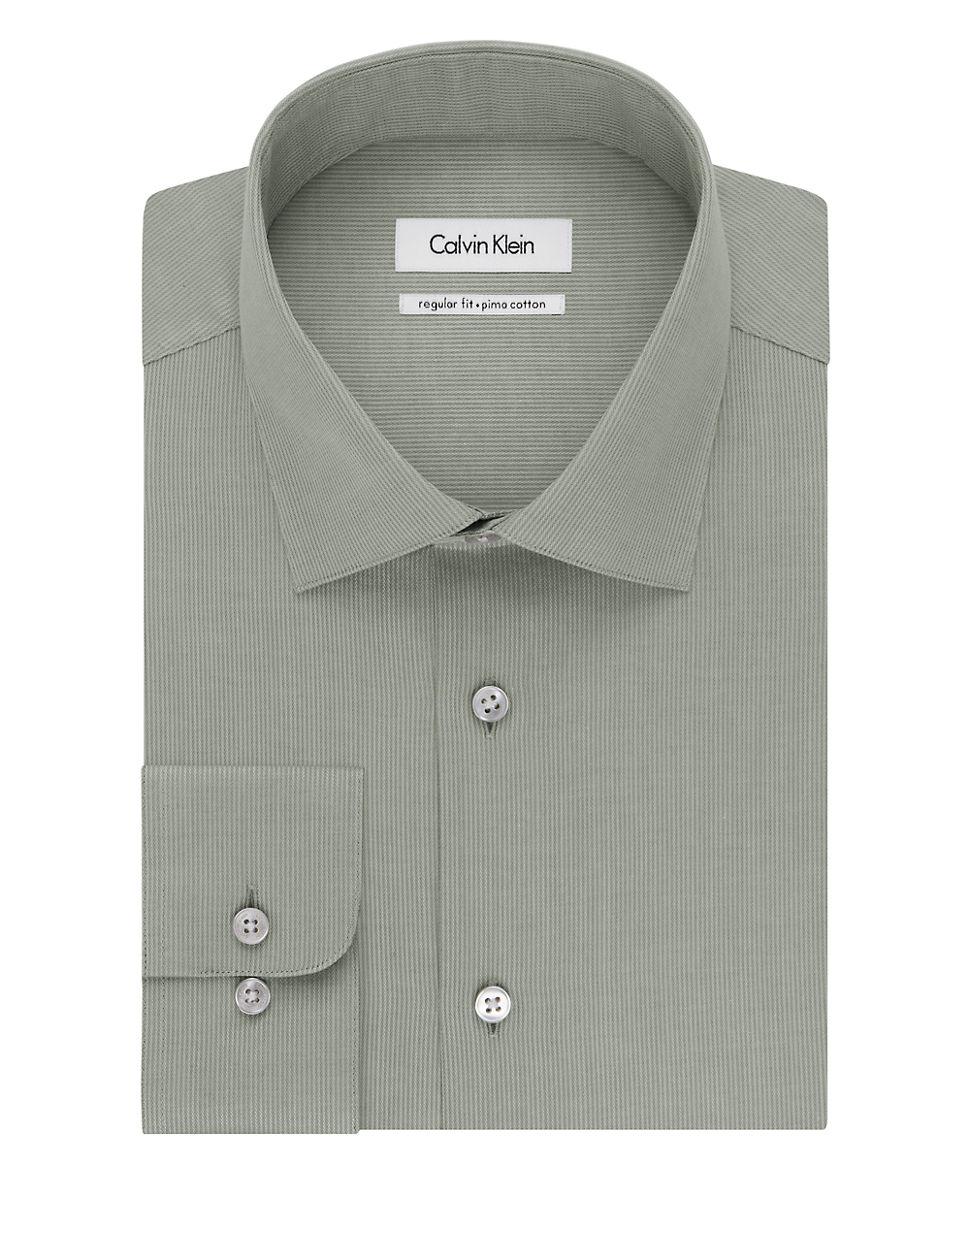 Calvin klein regular fit pima dress shirt in green for men for Regular fit dress shirt